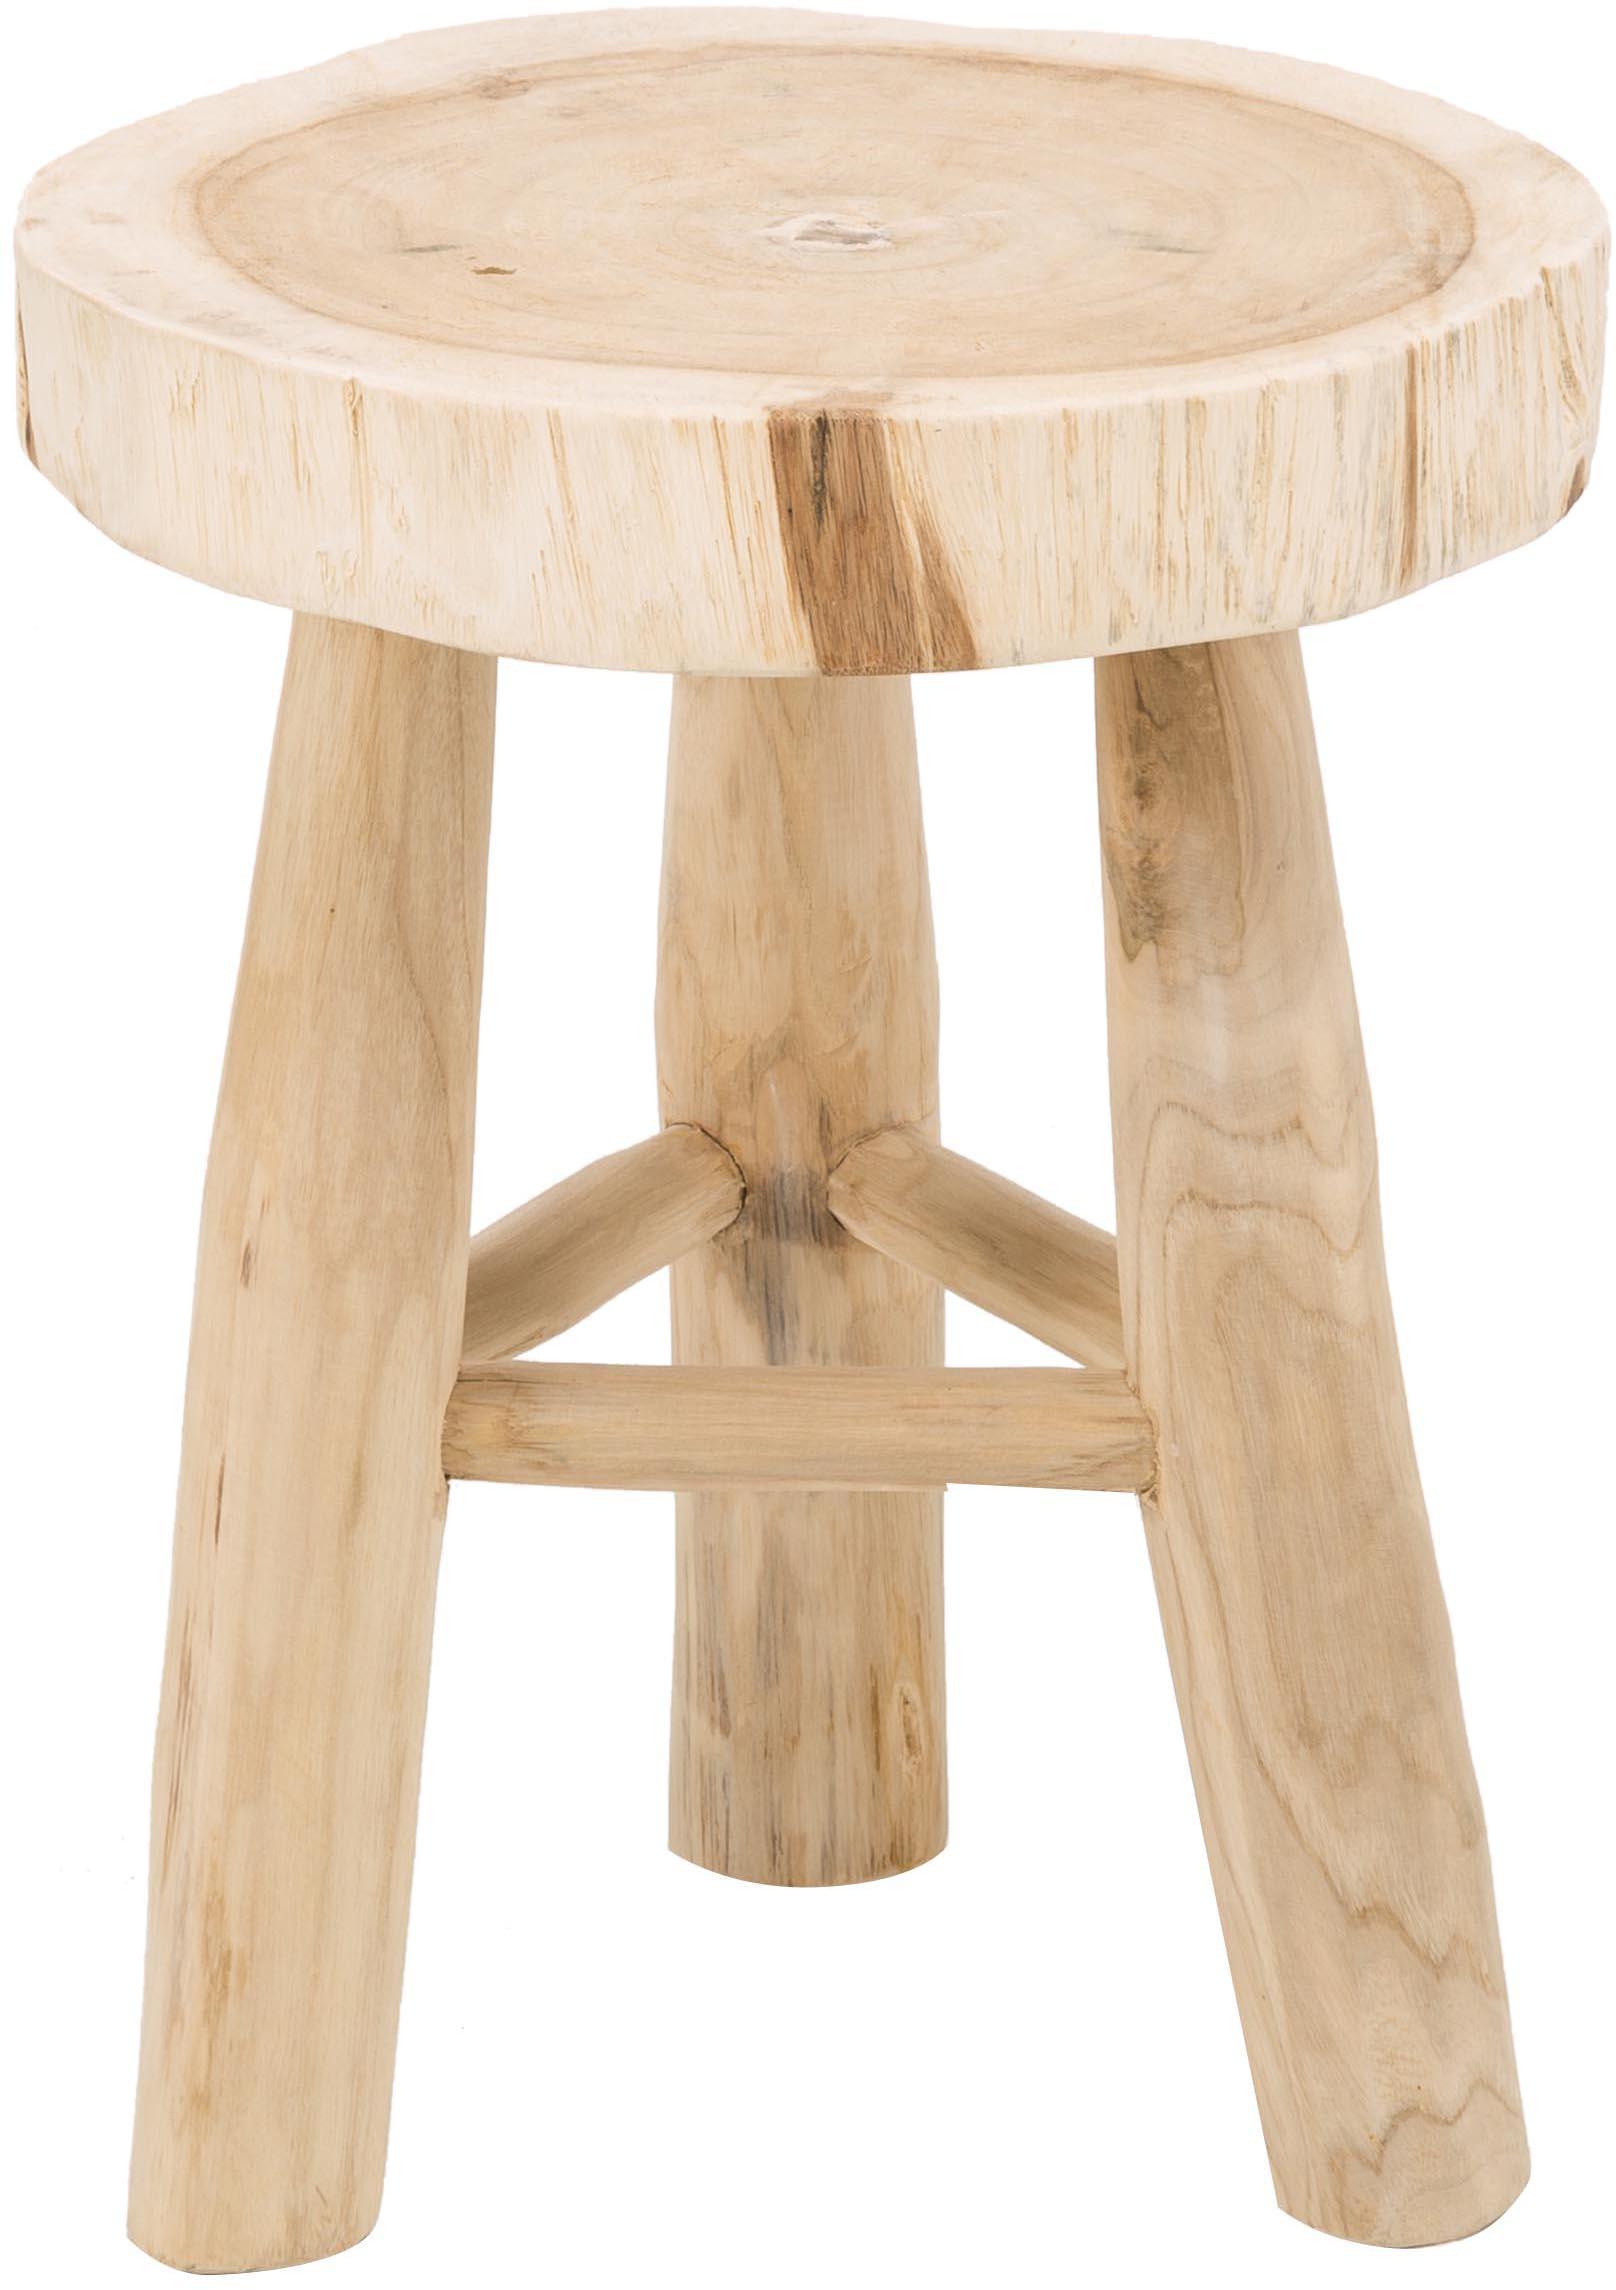 Ronde kruk Beachside van hout, Natuurlijk mungurhout, Lichtbruin, Ø 40 x H 50 cm